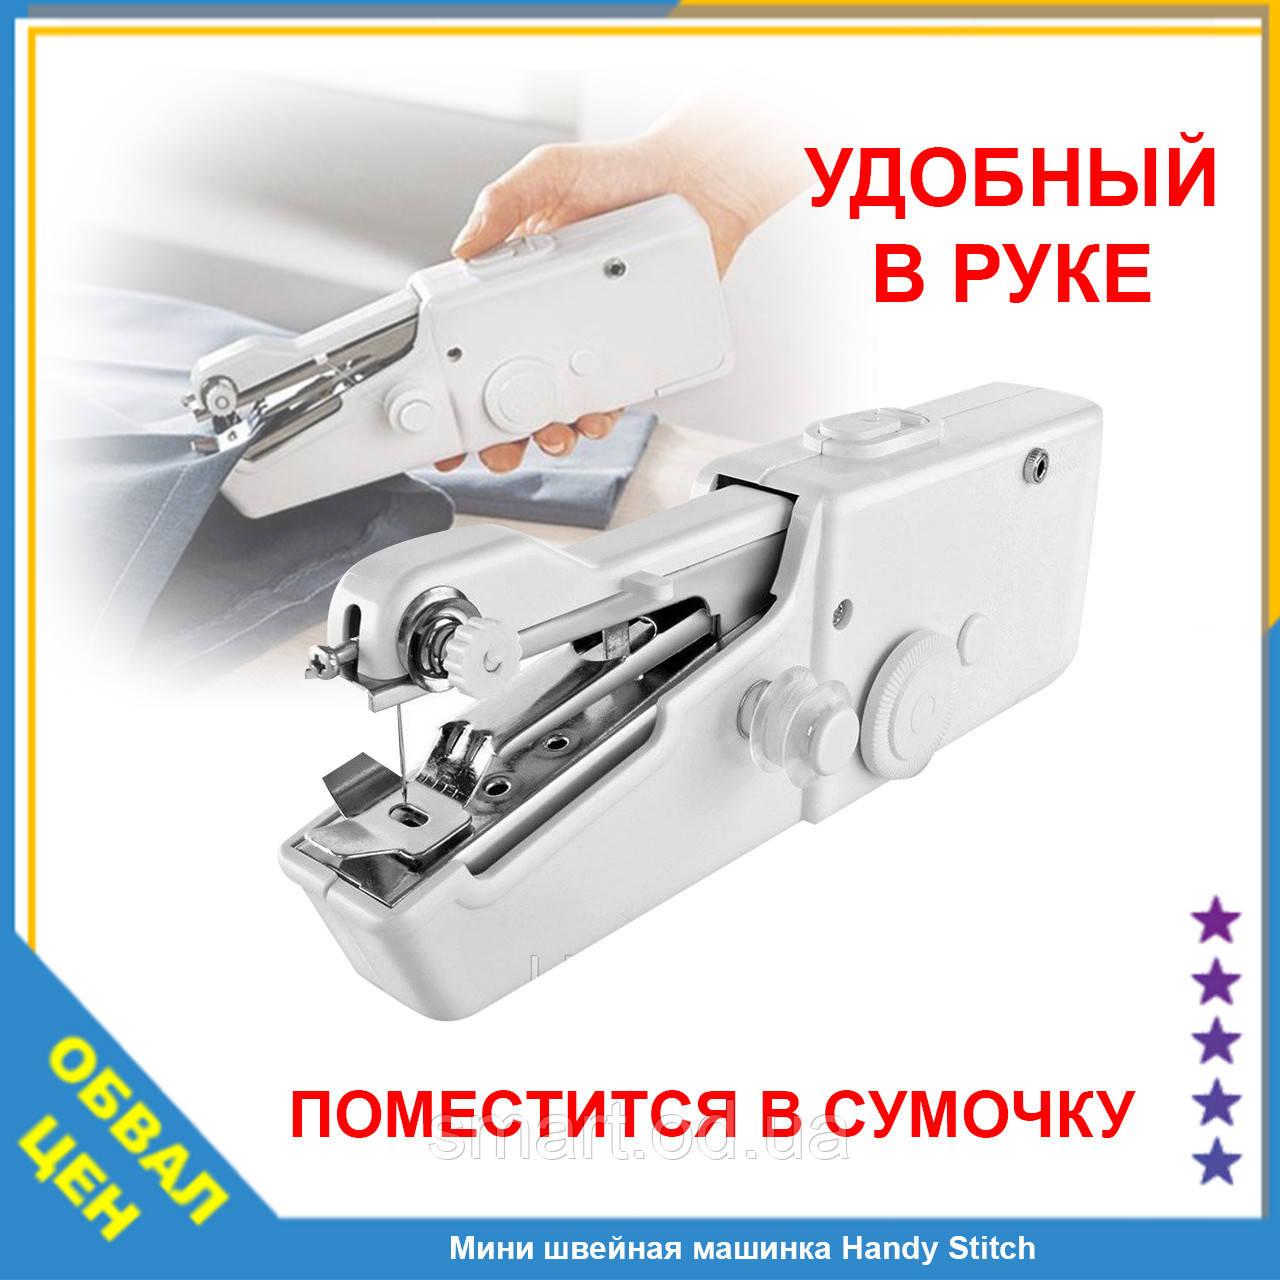 Ручна швейна машинка Switch handle / Домашня швейна машинка / швейна машина